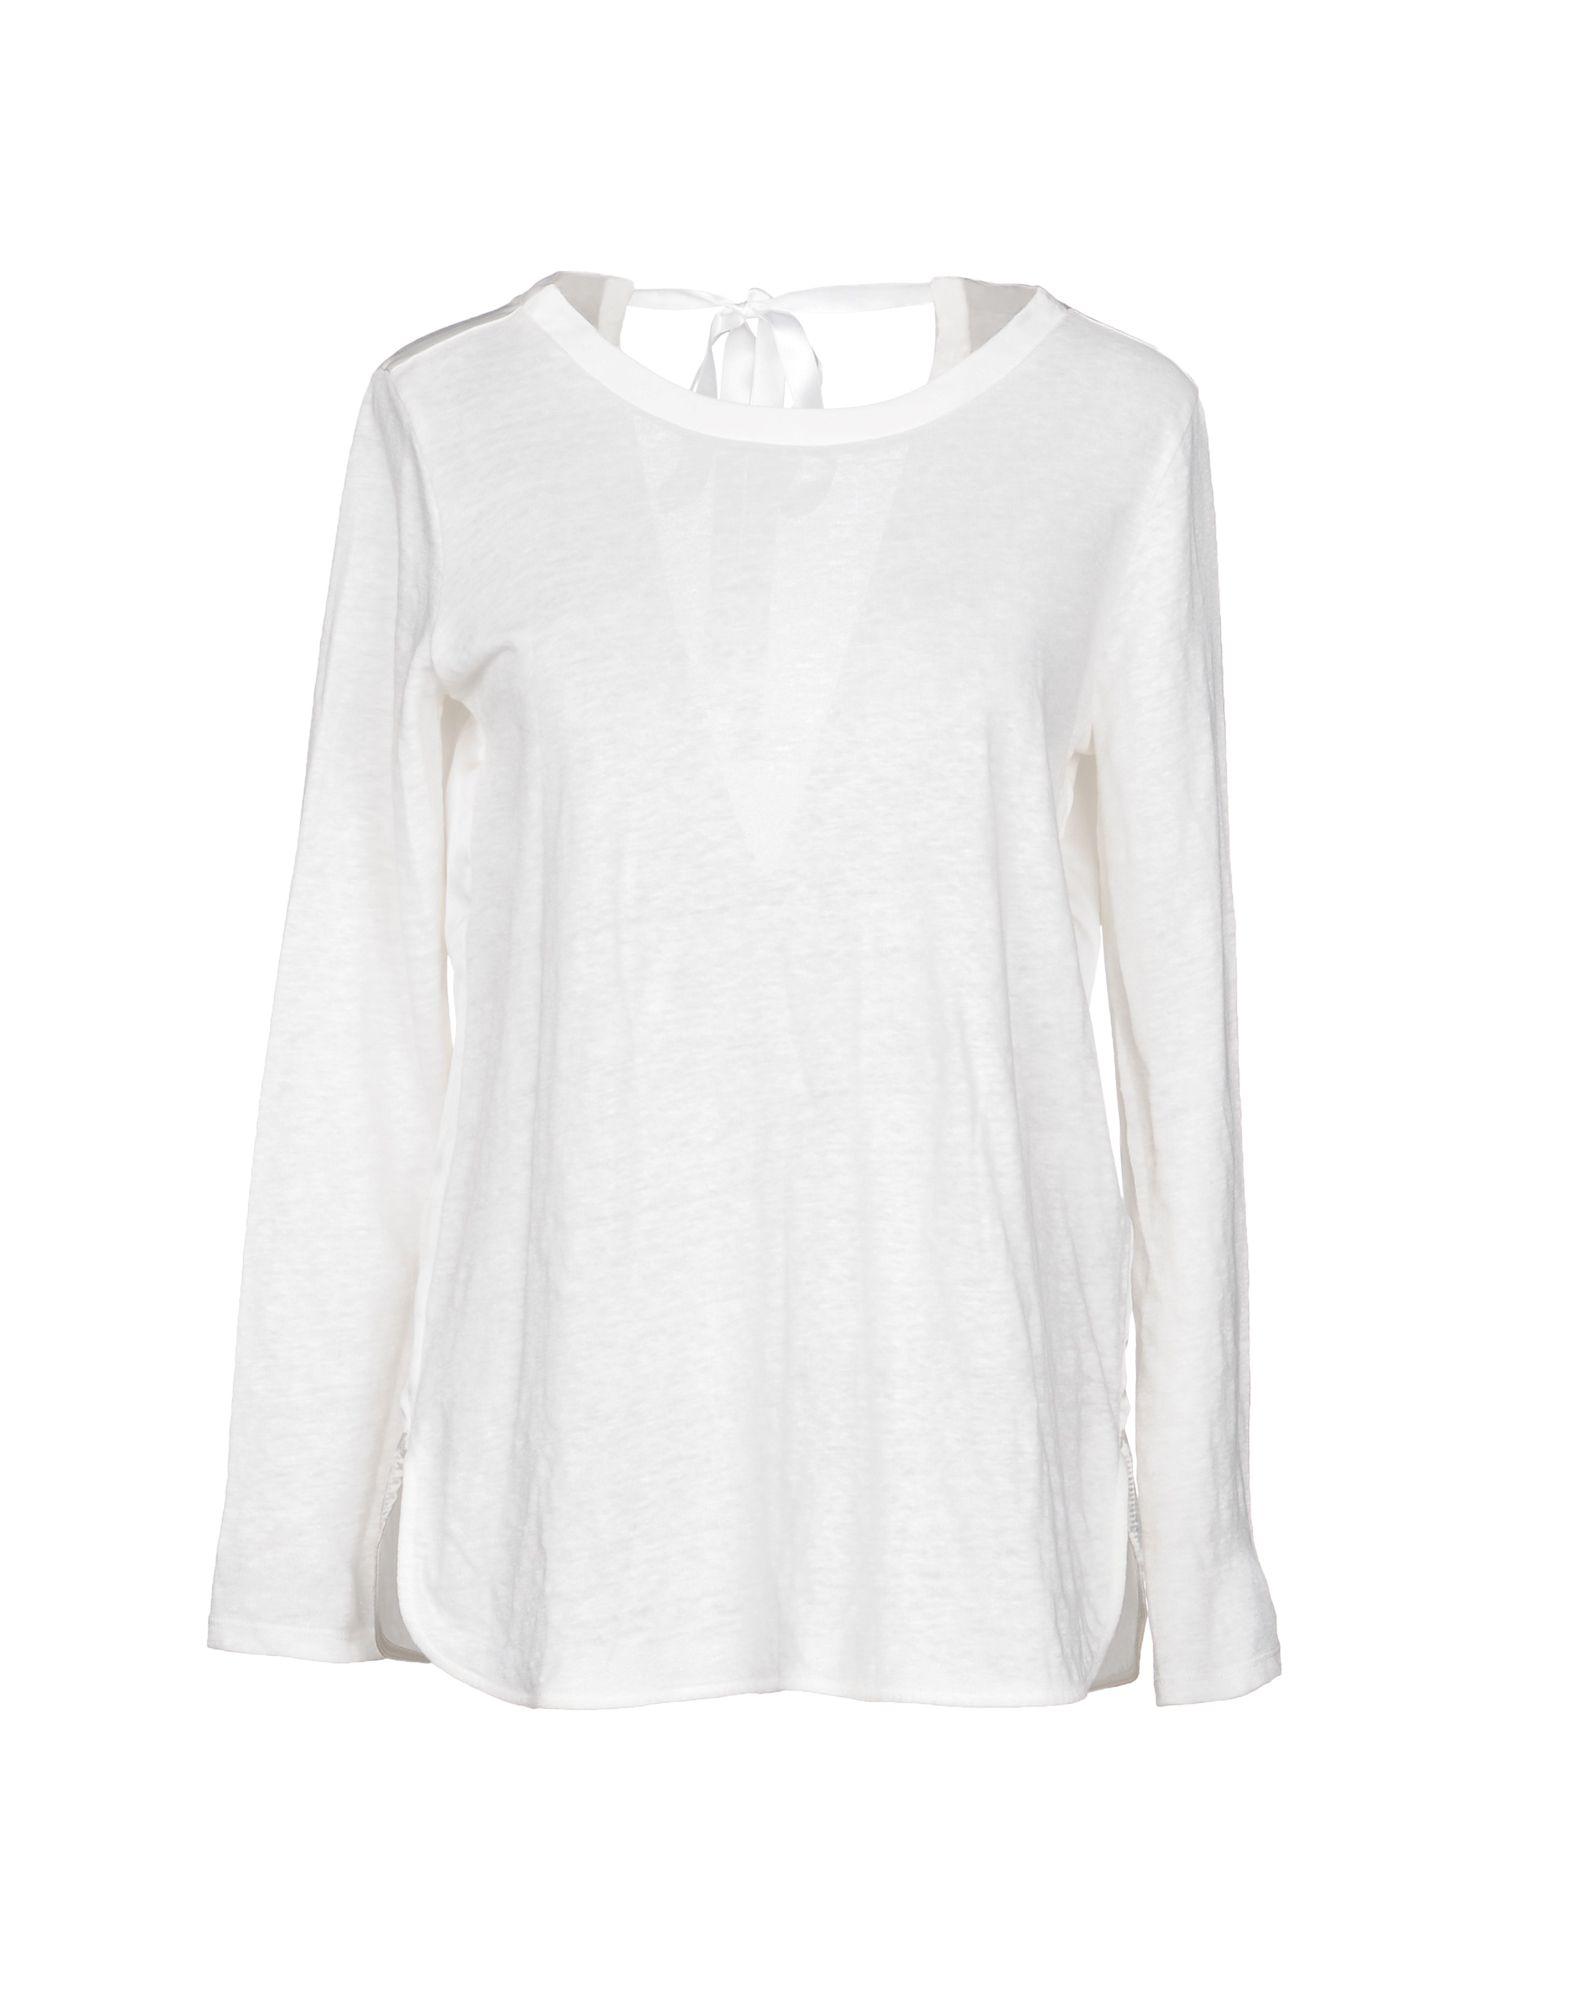 SANDRO PARIS T-Shirt in Ivory